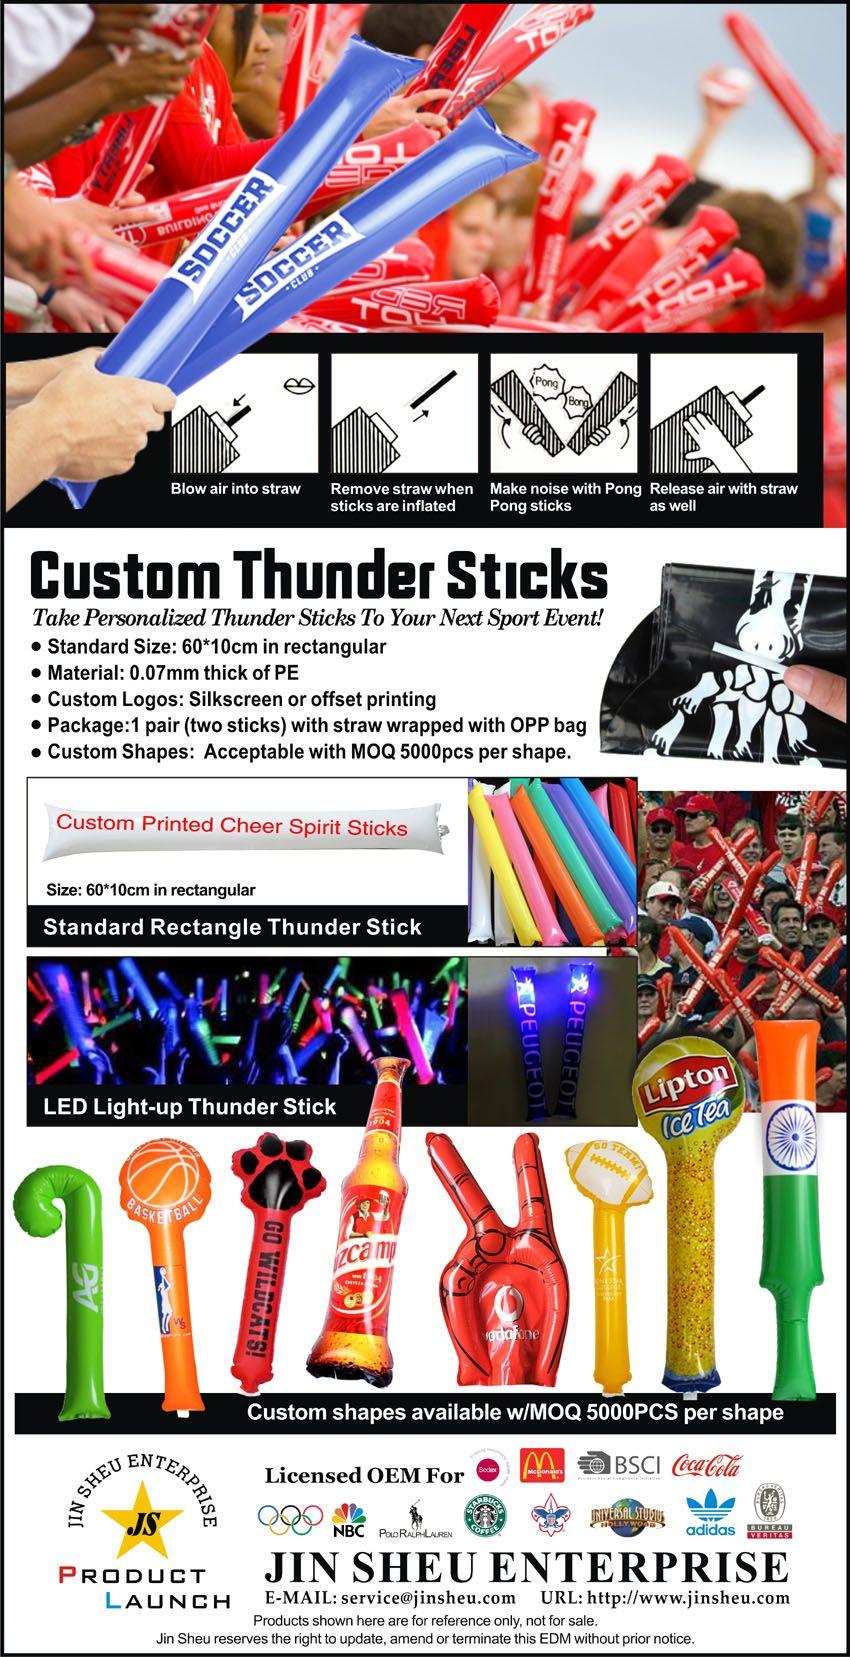 One-stop supplier of high-quality custom thunder sticks